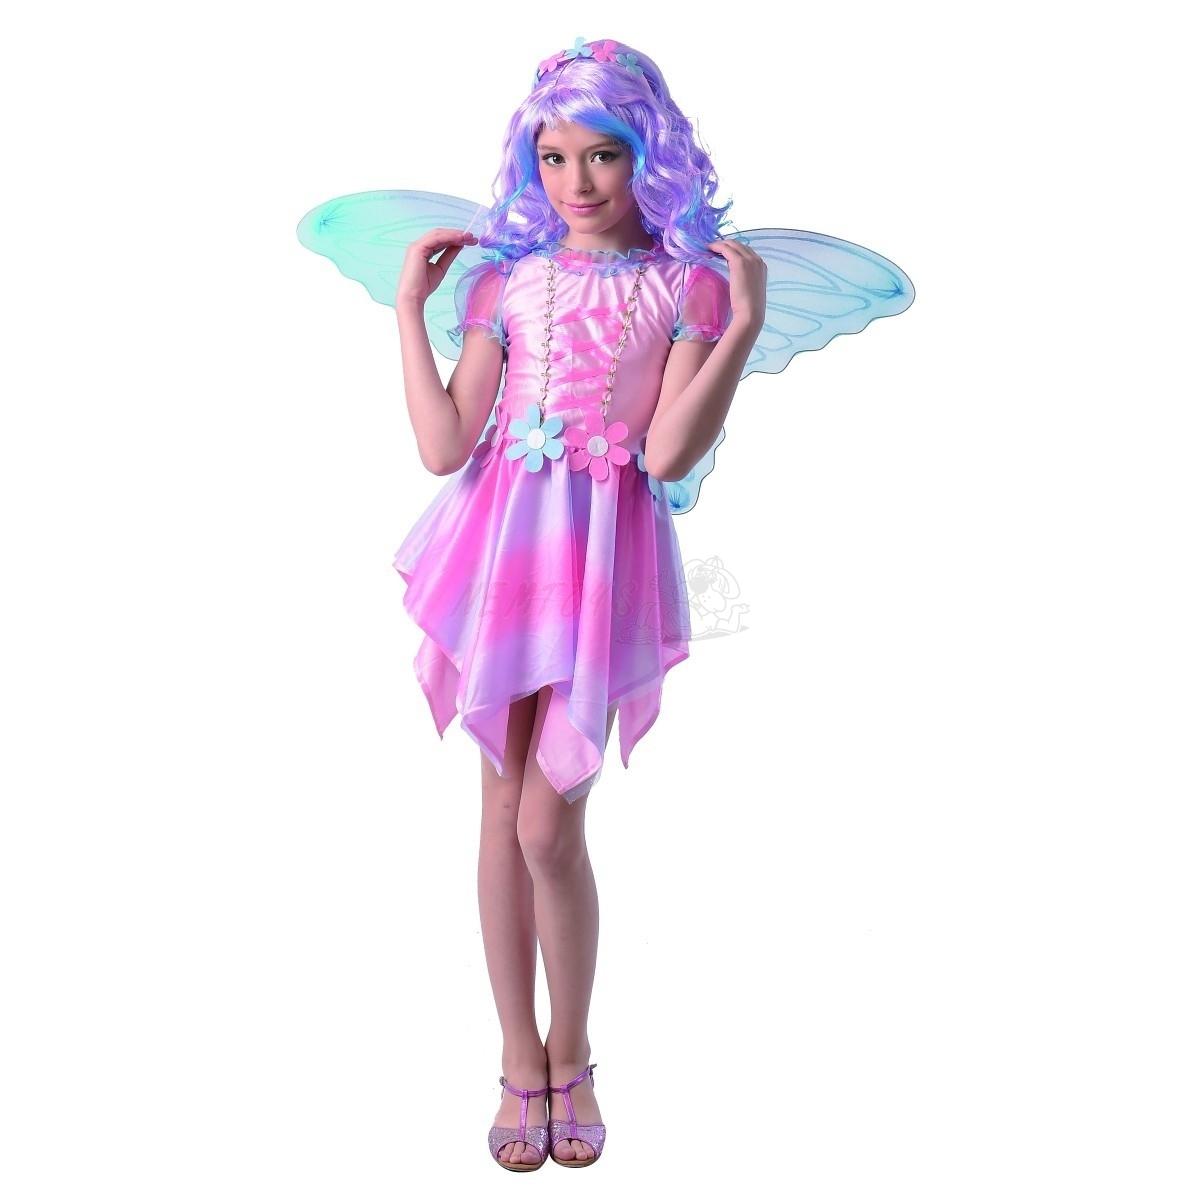 Dětský karnevalový kostým - víla motýl, 120 - 130  cm